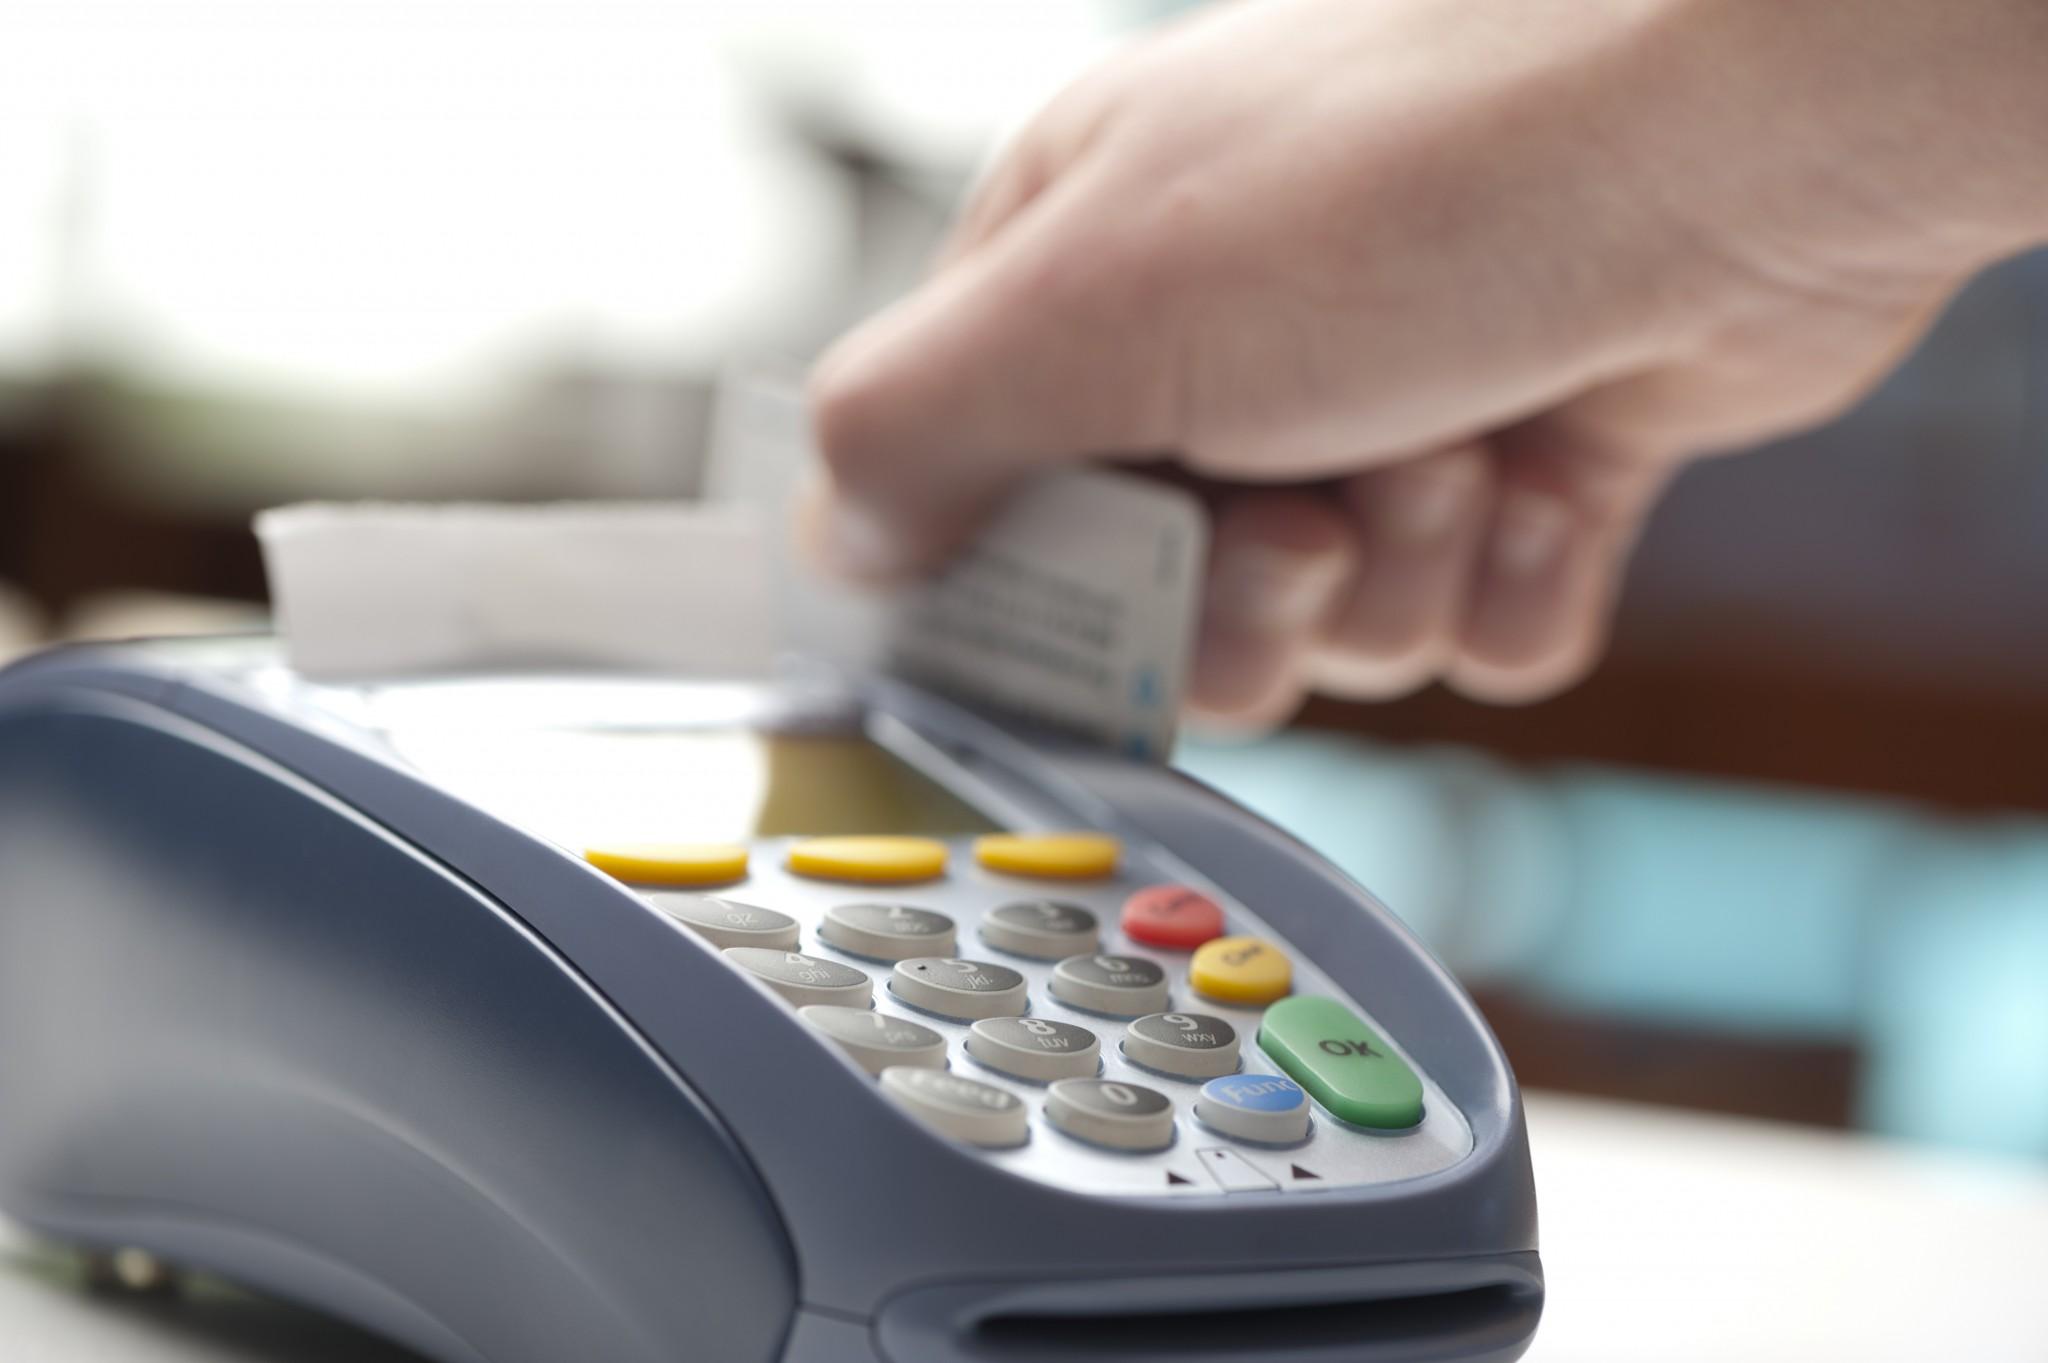 What the New Prepaid Debit Card Rules Say - NerdWallet